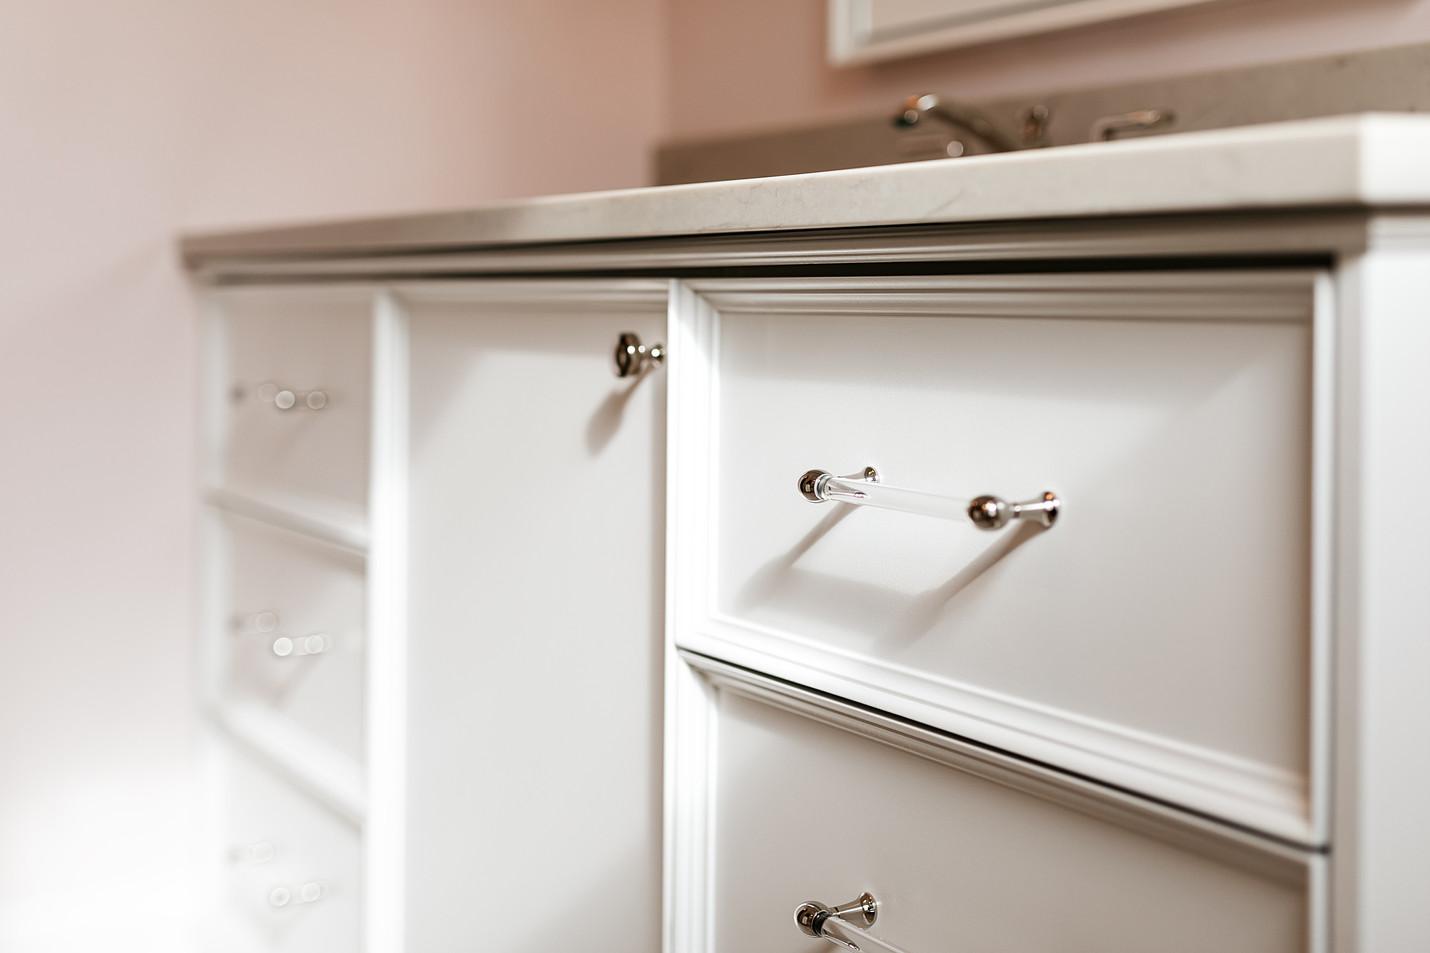 T_Waycliffe_drawer detail.jpg